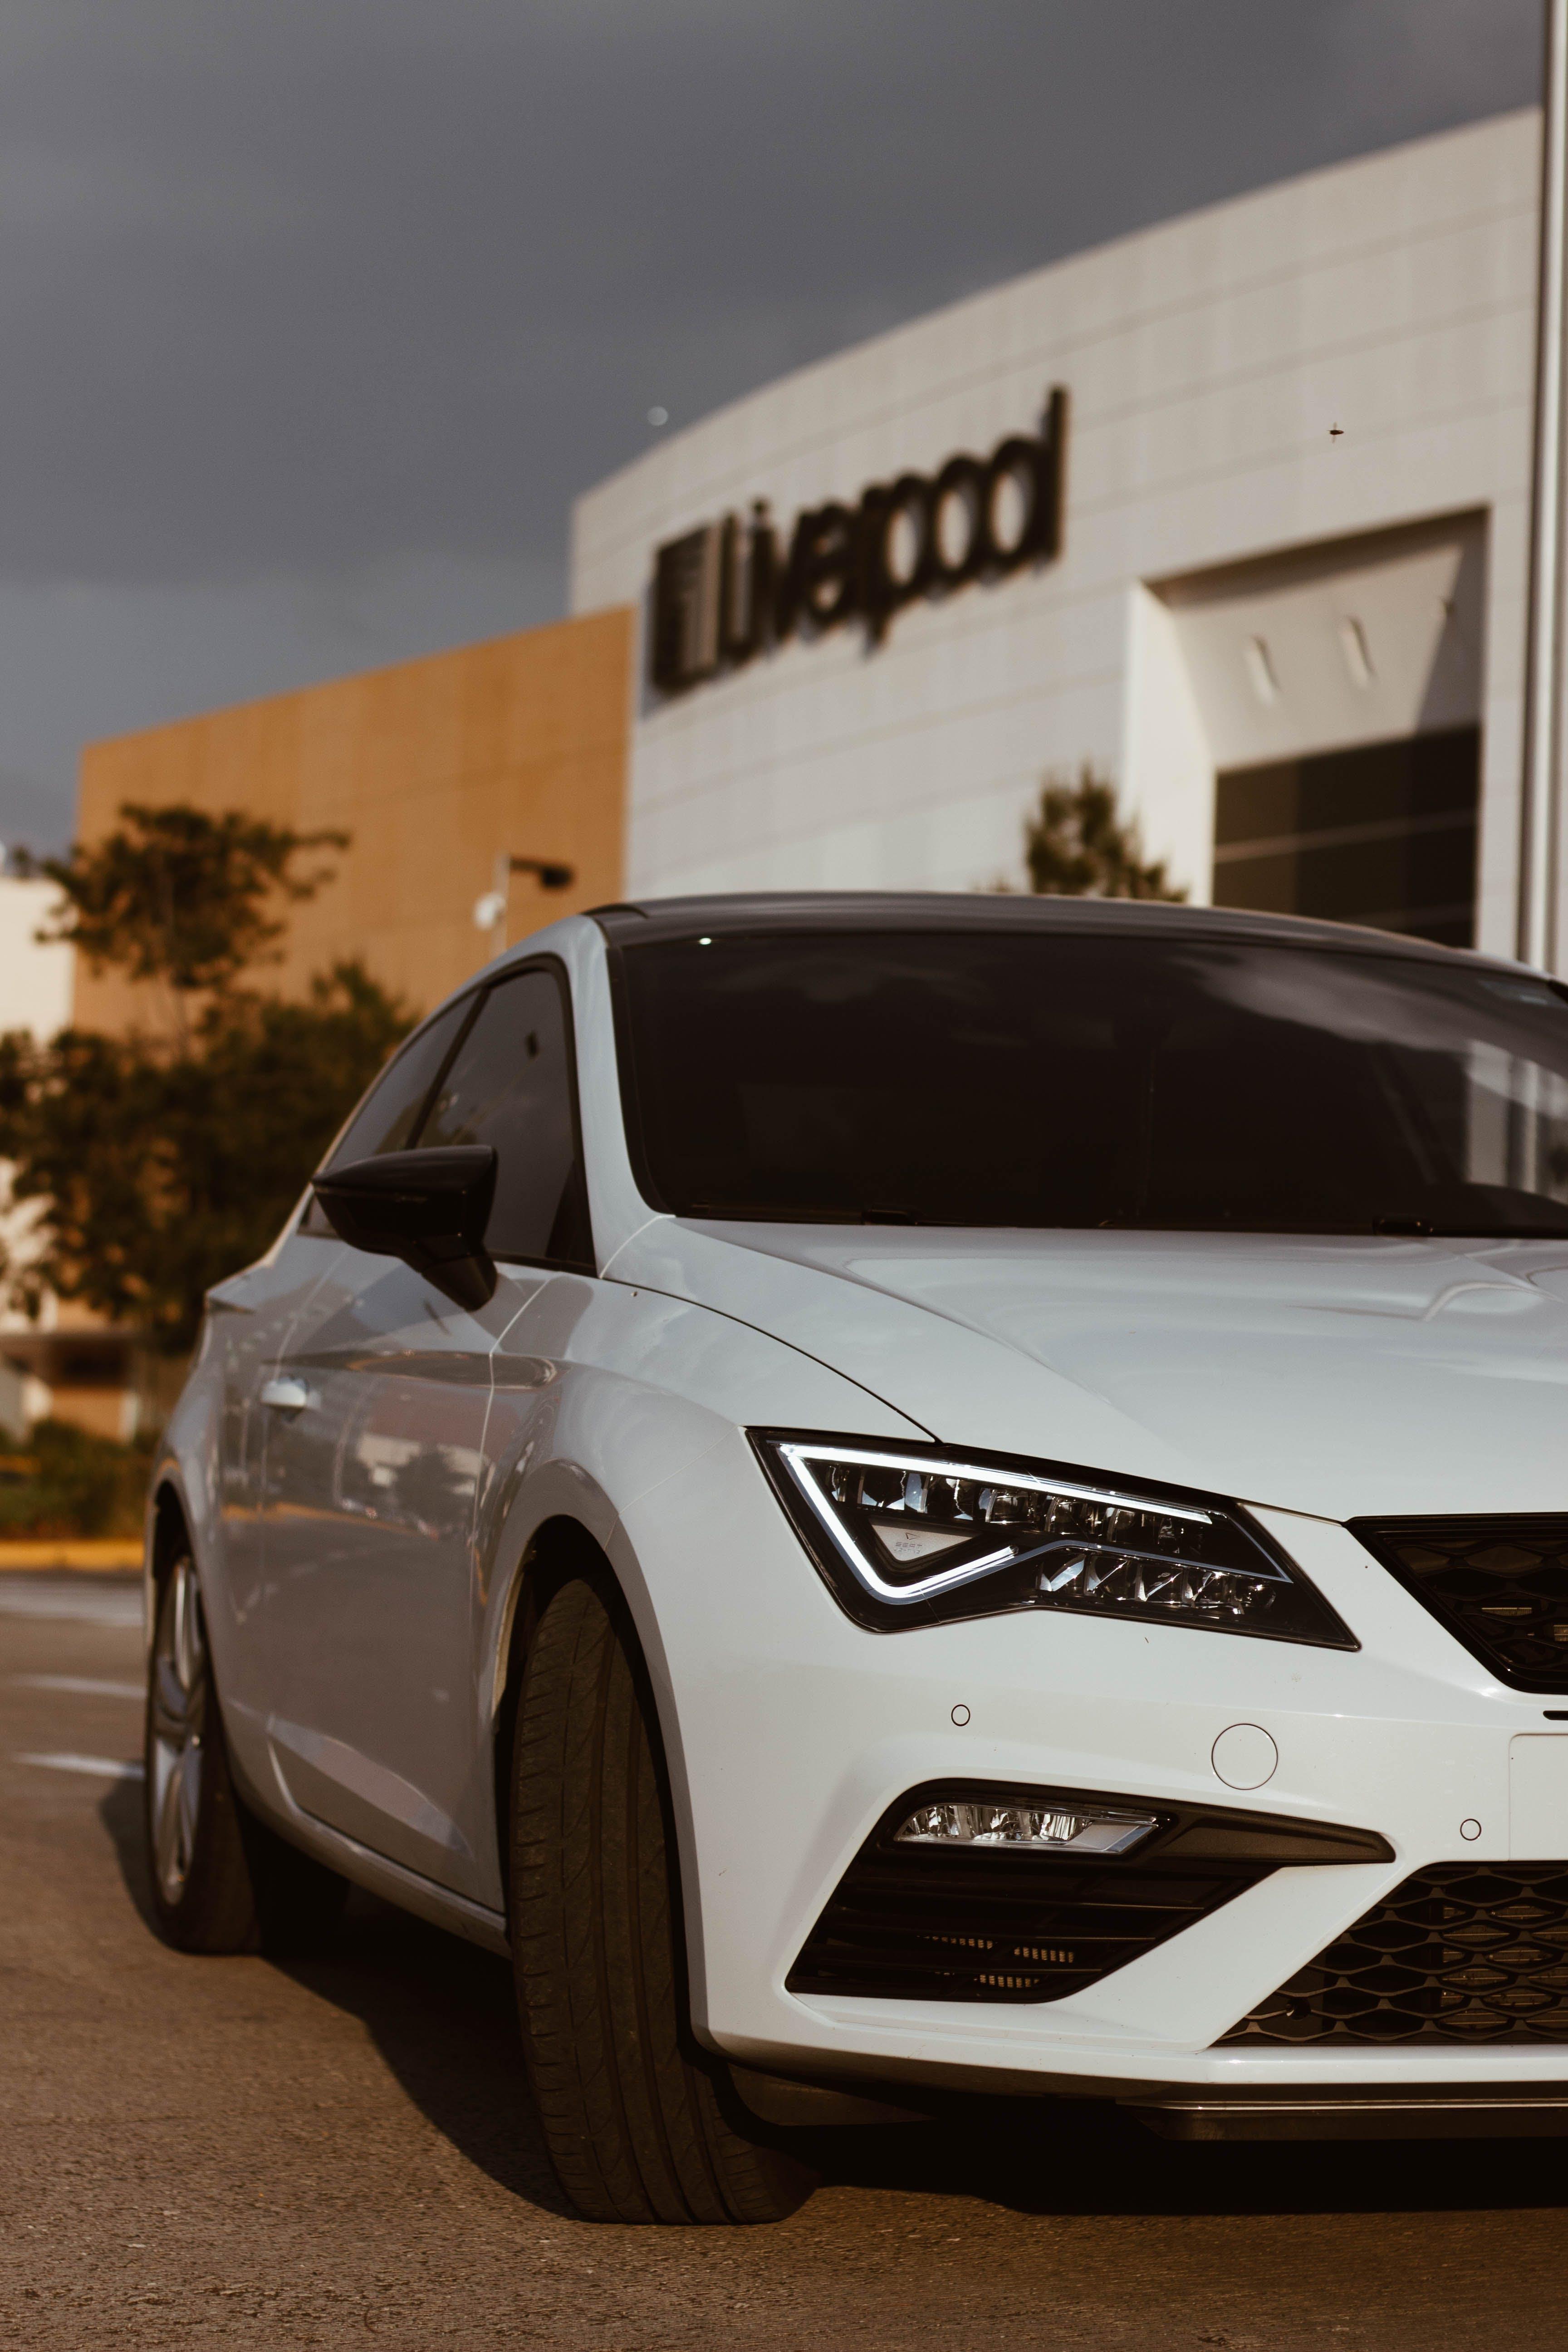 Kostenloses Stock Foto zu auto, auto model, auto wallpaper, autoscheinwerfer